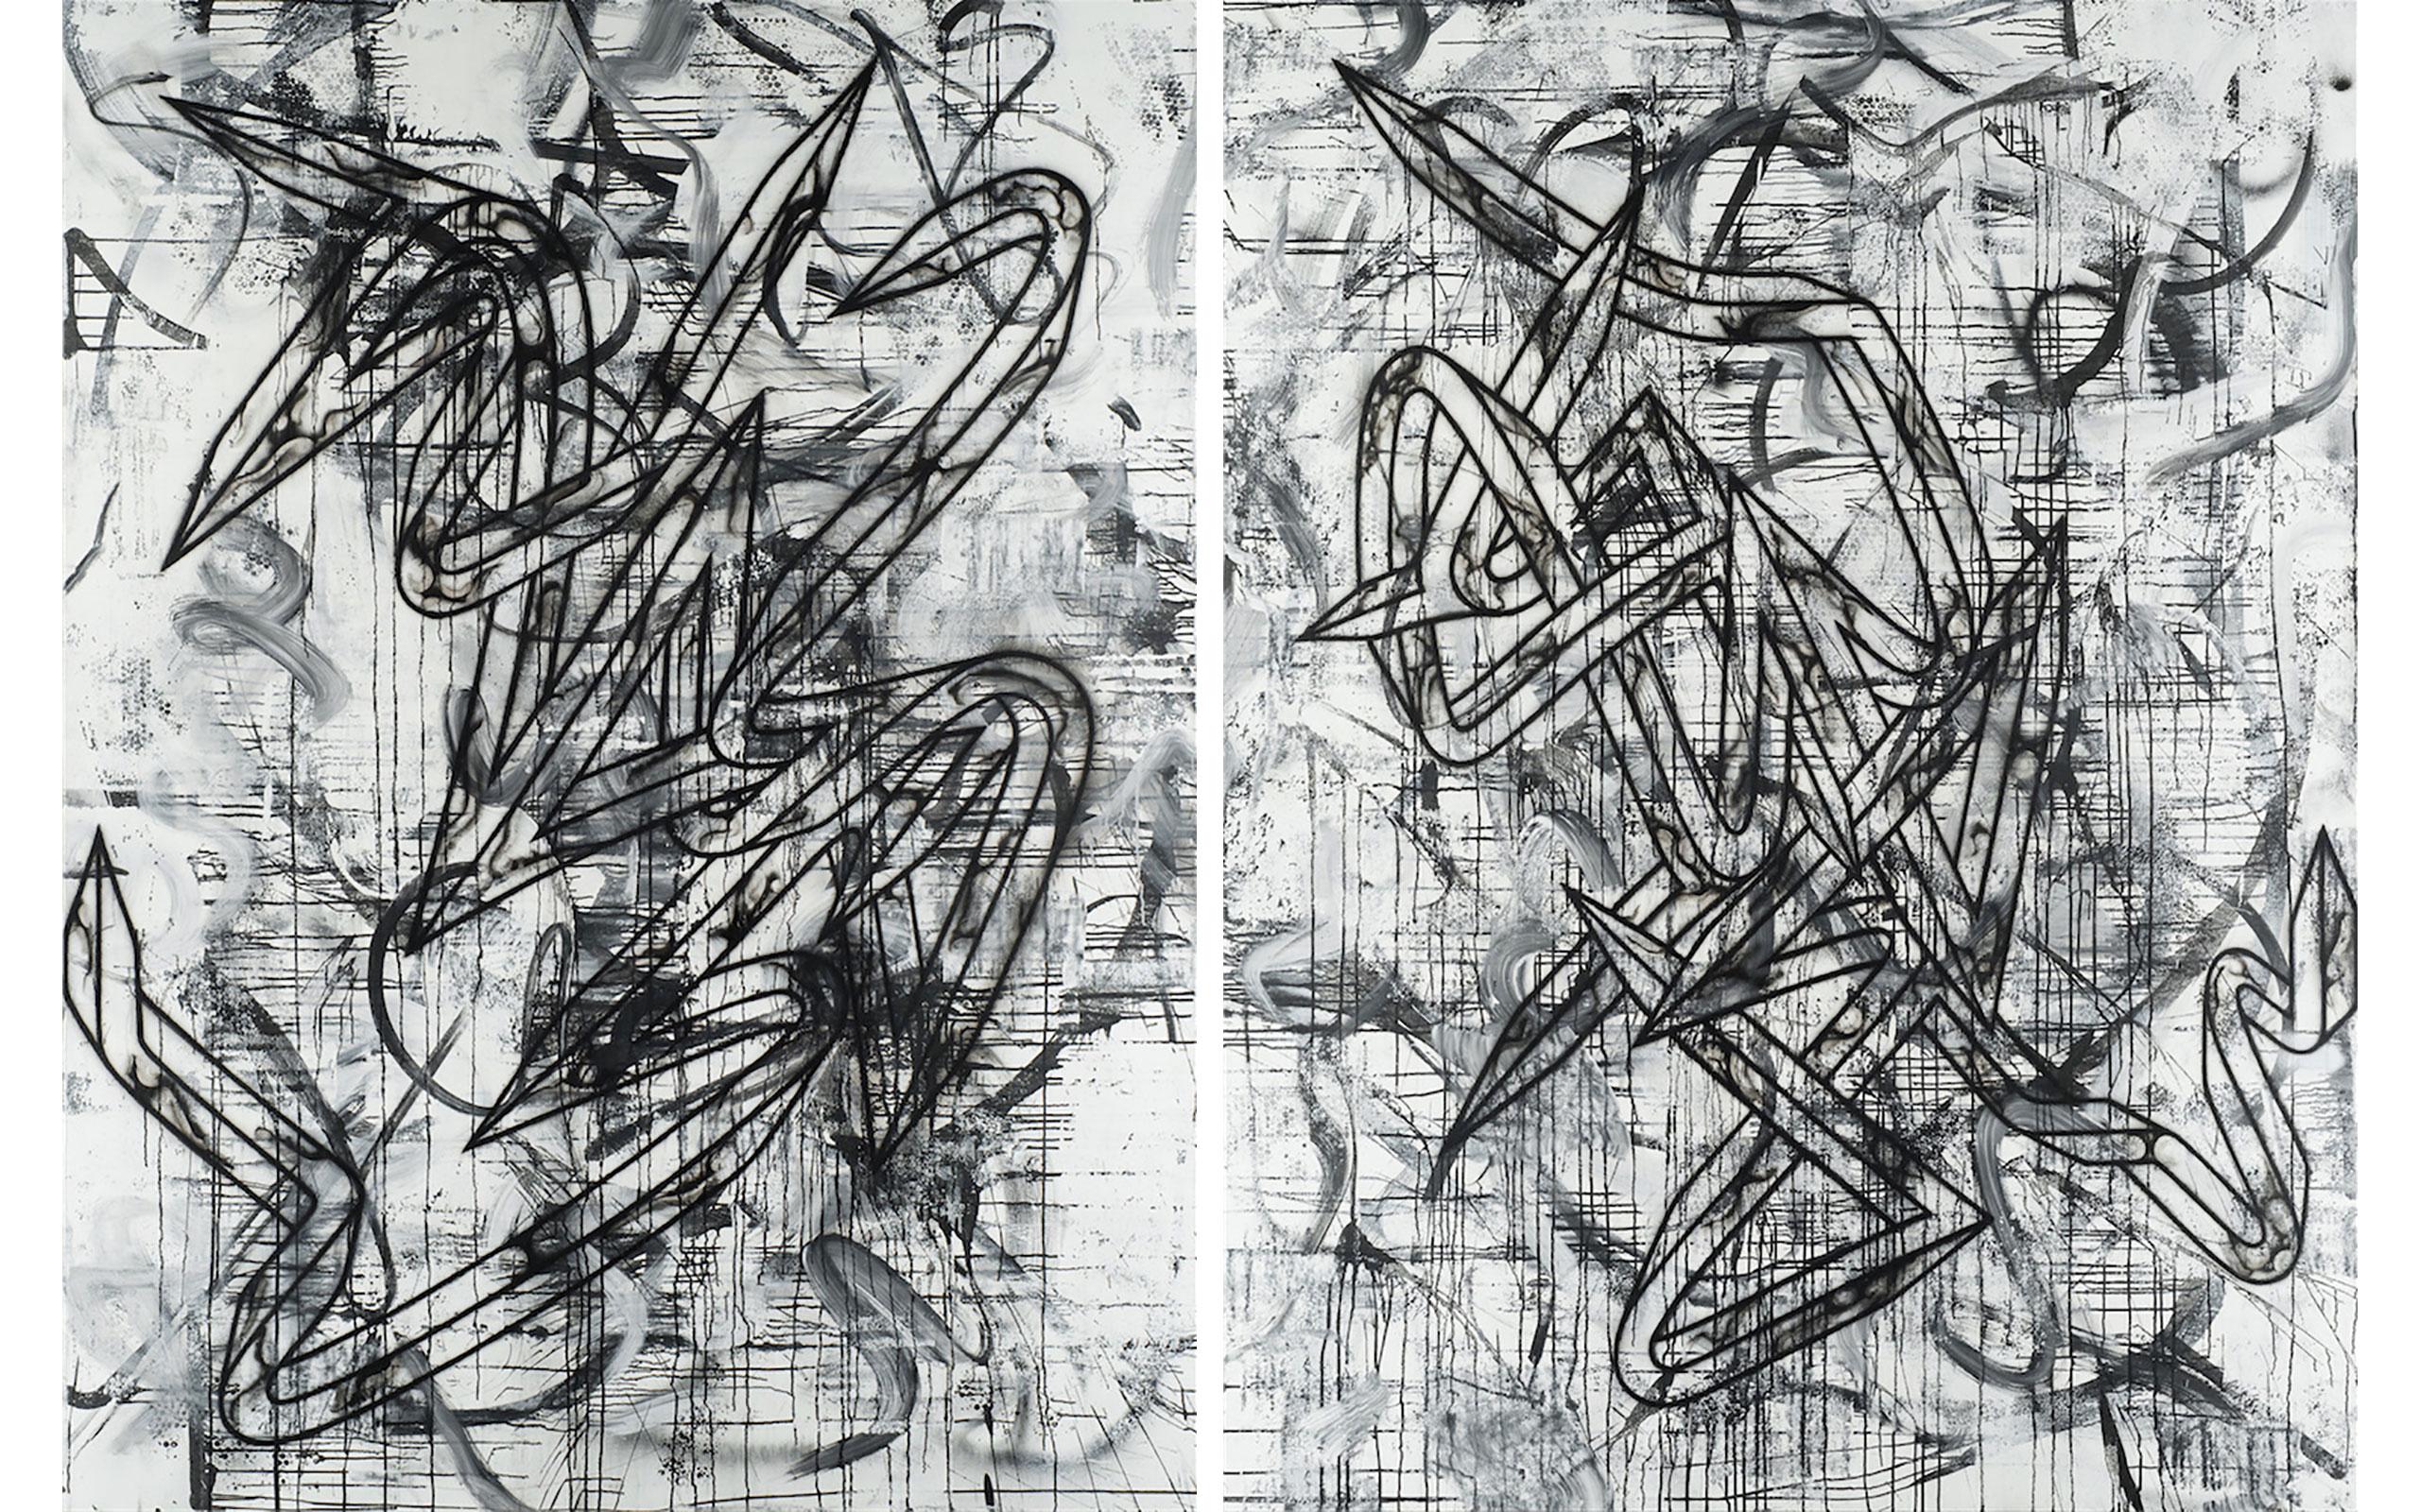 Enrico Isamu Ōyama, FFIGURATI #162, FFIGURATI #163, 2017, Airbrush, acrylic aerosol paint, sumi ink and latex paint on canvas mounted on aluminum stretcher, (H)2.44m x (W)1.83m (each), Artwork © Enrico Isamu Ōyama, Photo © Atelier Mole